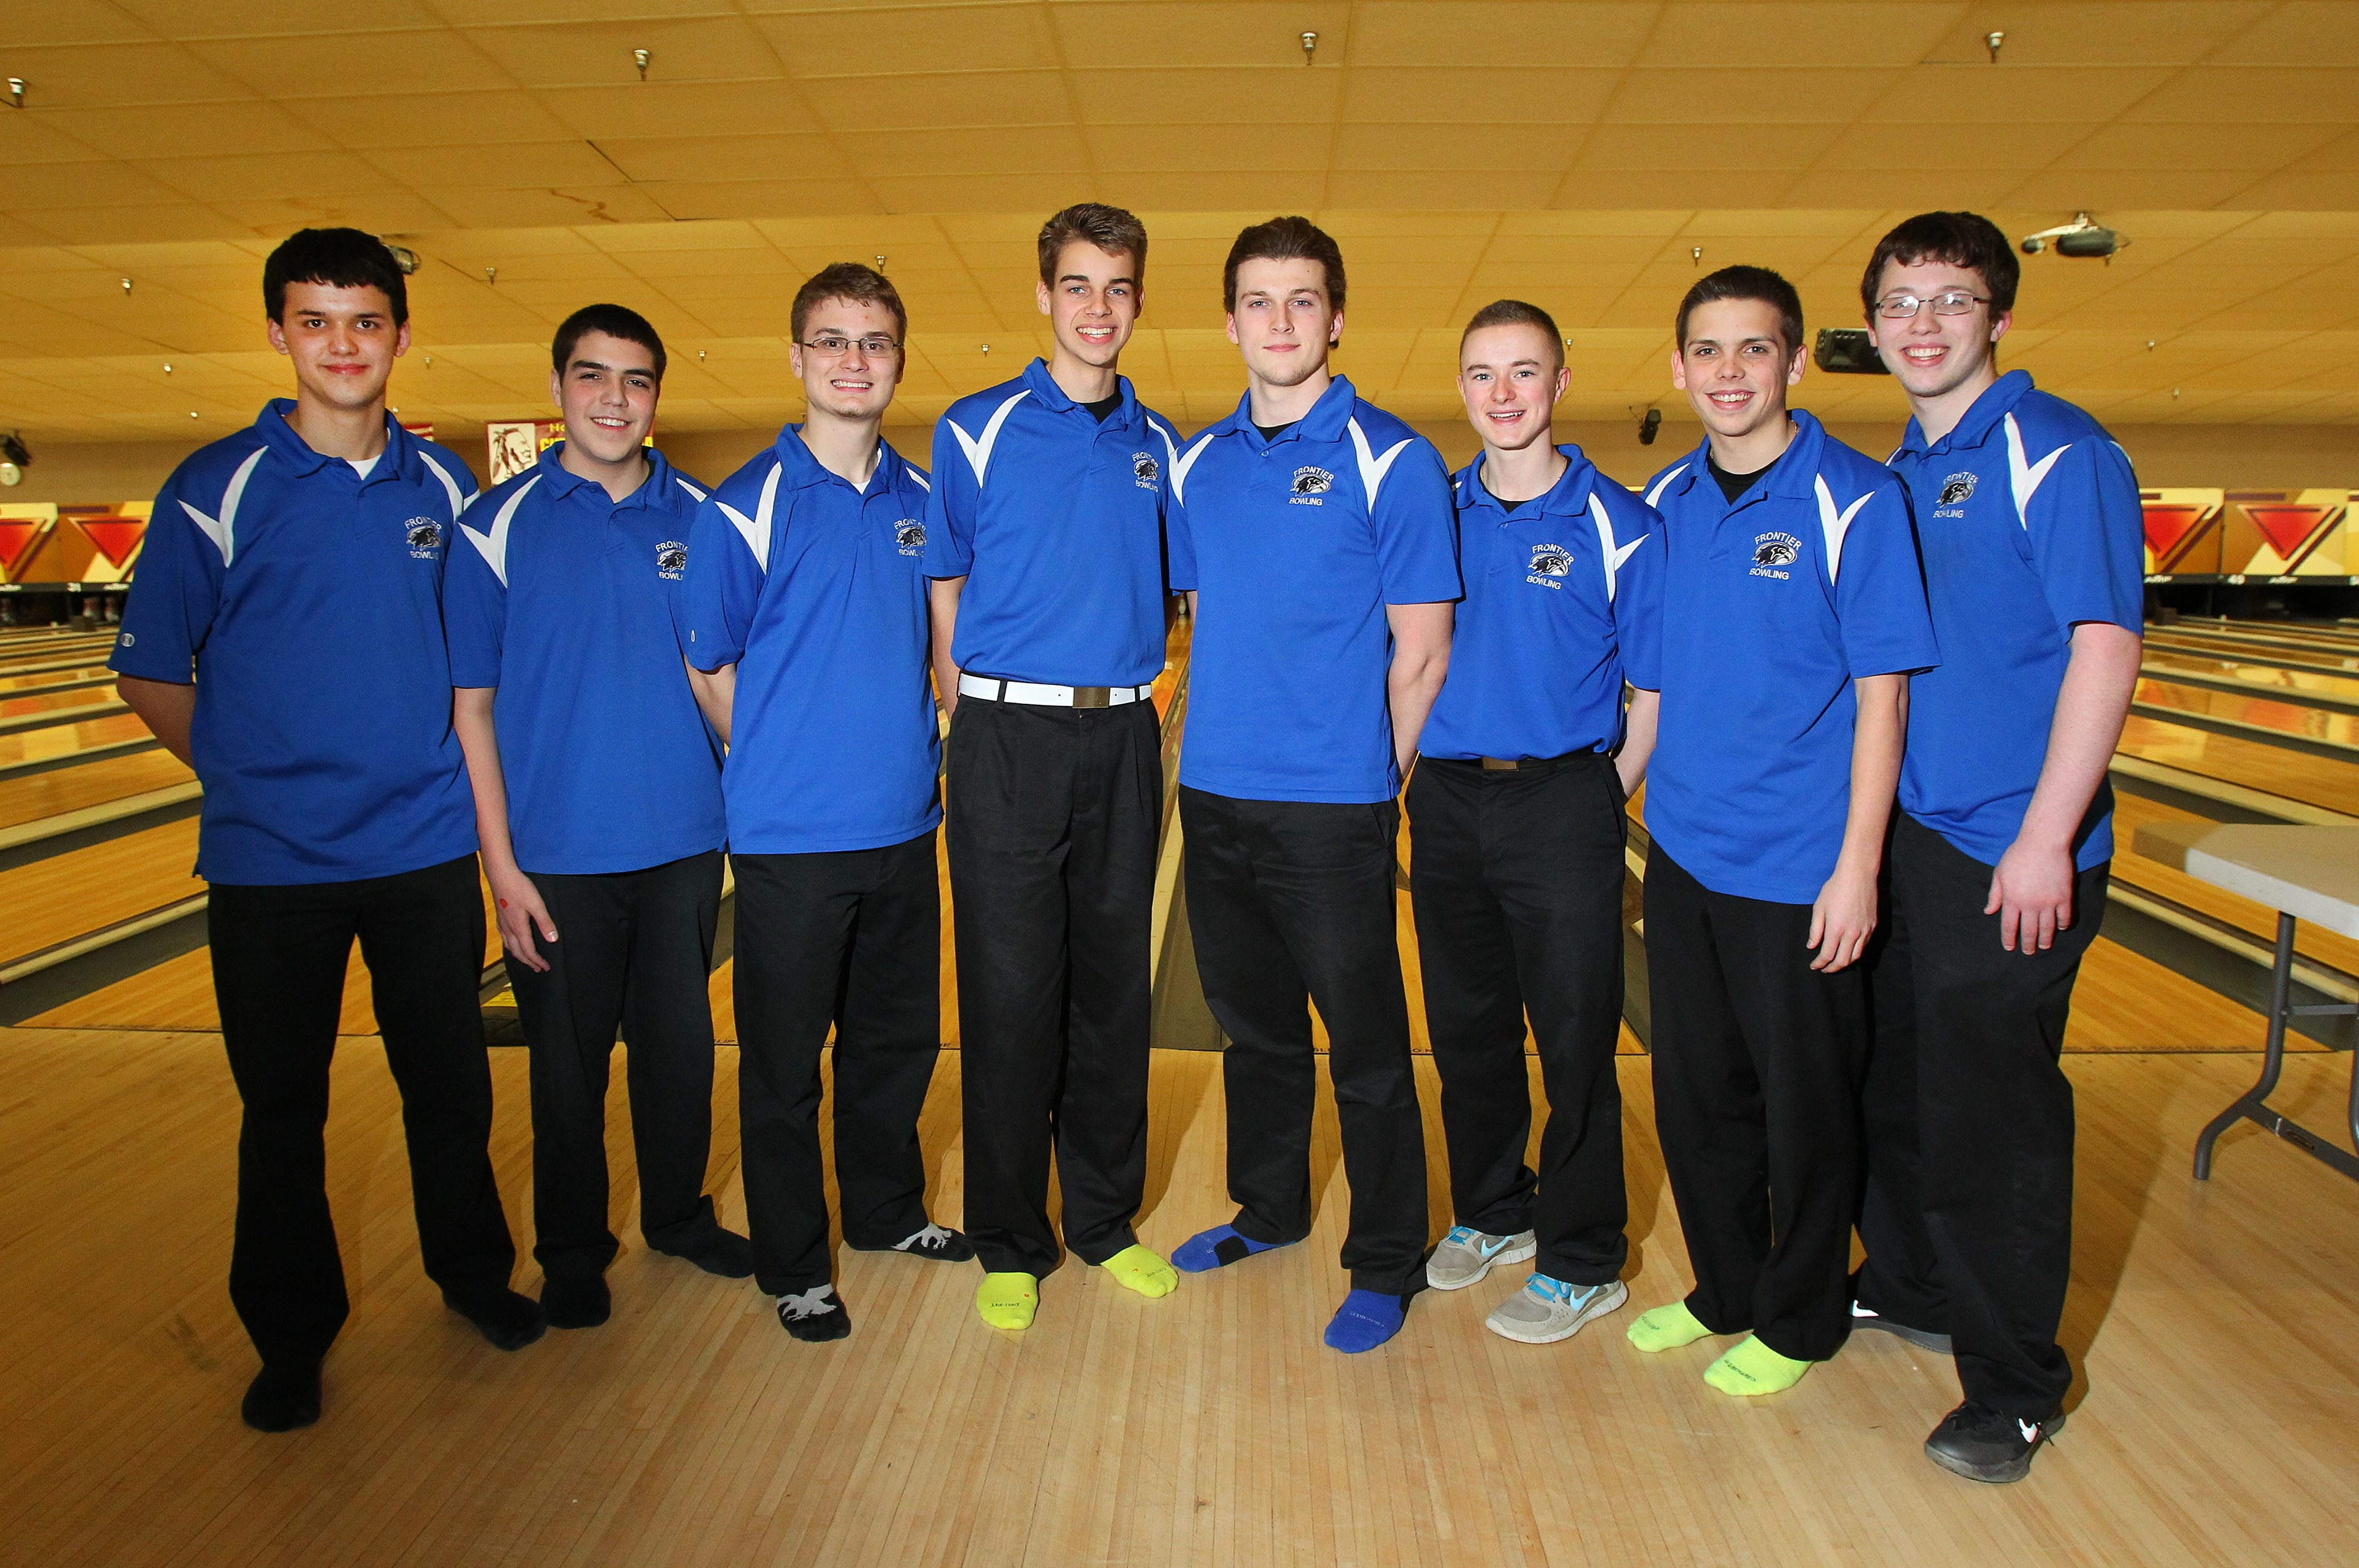 The Section VI bowling team champions from Frontier, from left, are Bryan Carson, Nick DiFlavio, Matt Kinn, Nick Brooks, Ryan Harvey, Justin Thomas, Brendan Boechel and Chad Mee.